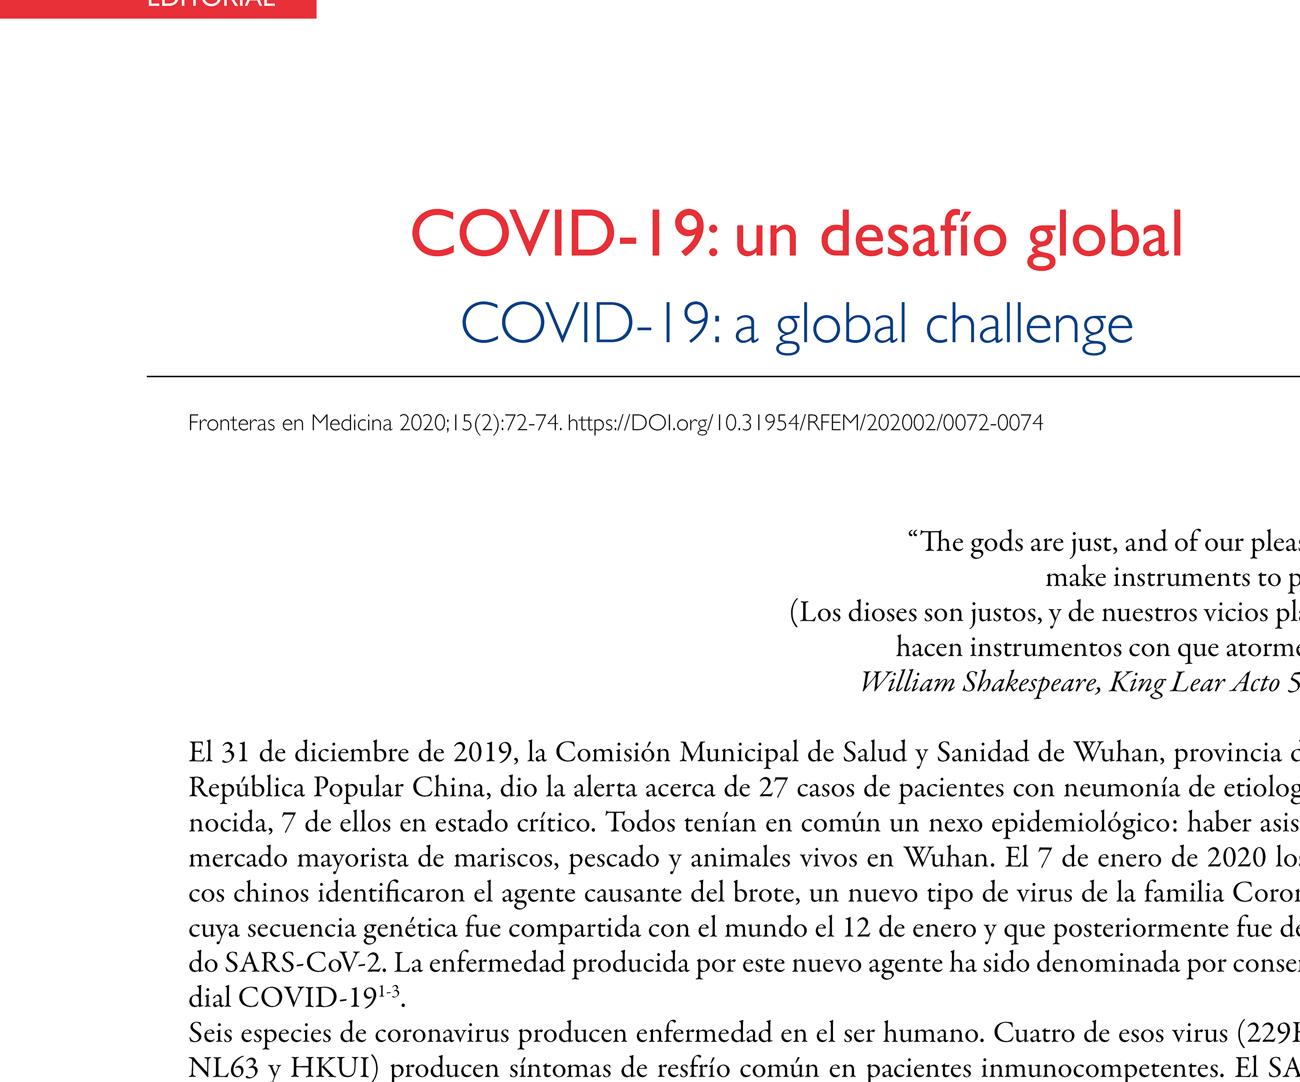 COVID-19: un desafío global